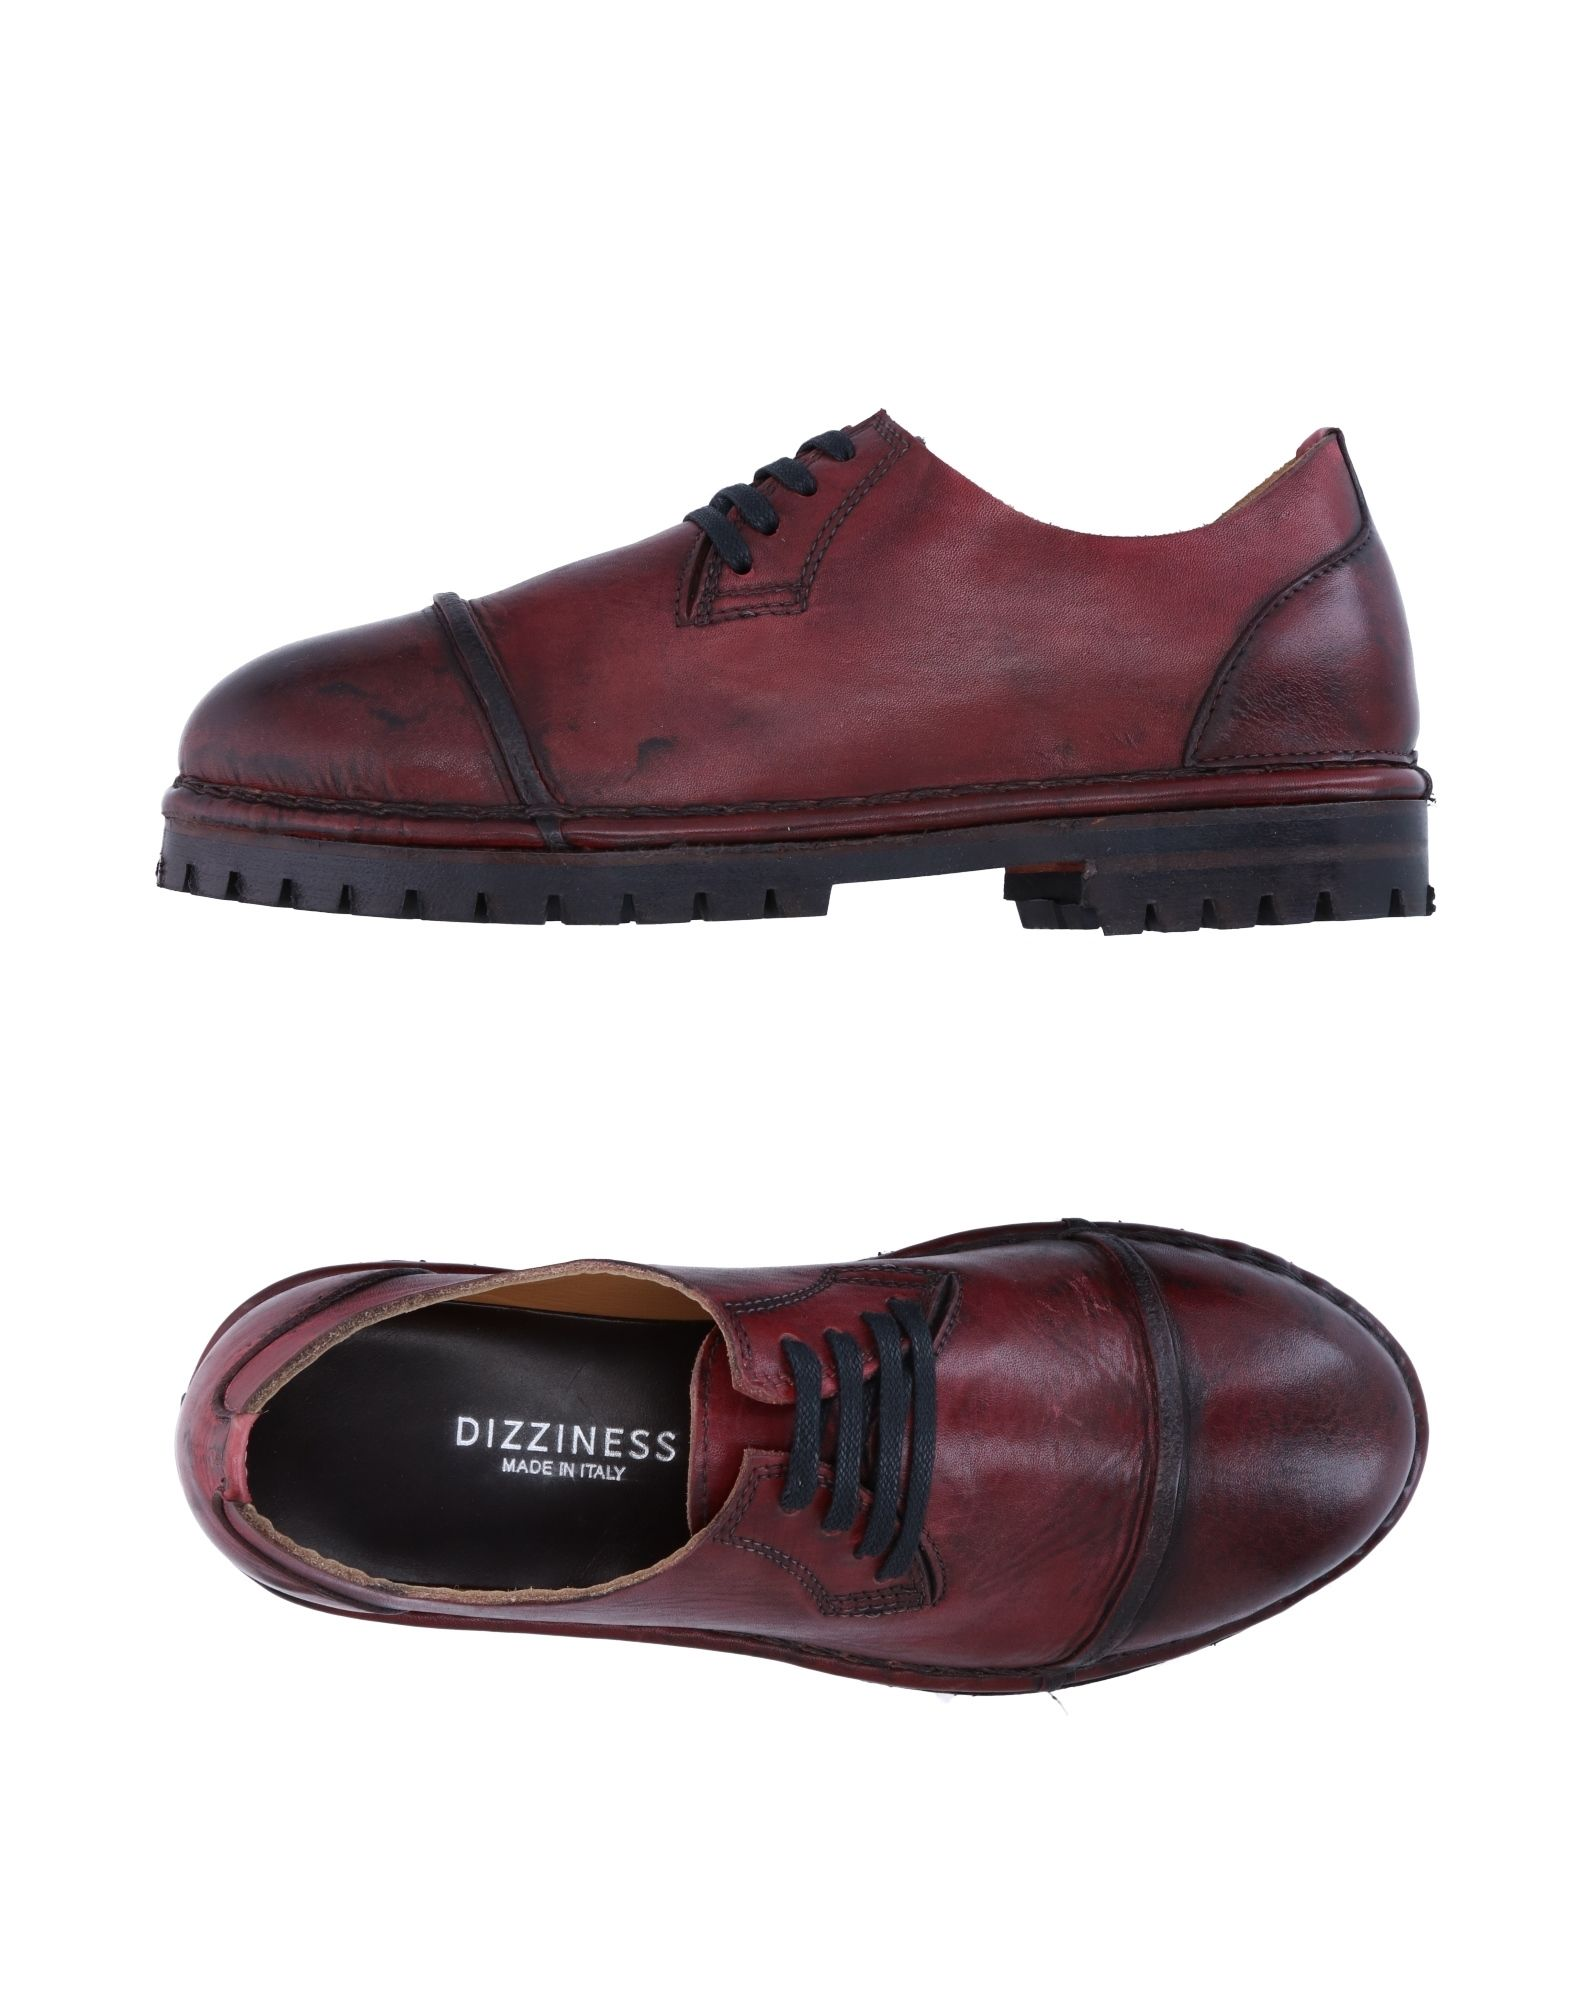 Dizziness Schnürschuhe Damen  11263106WI Gute Qualität beliebte Schuhe